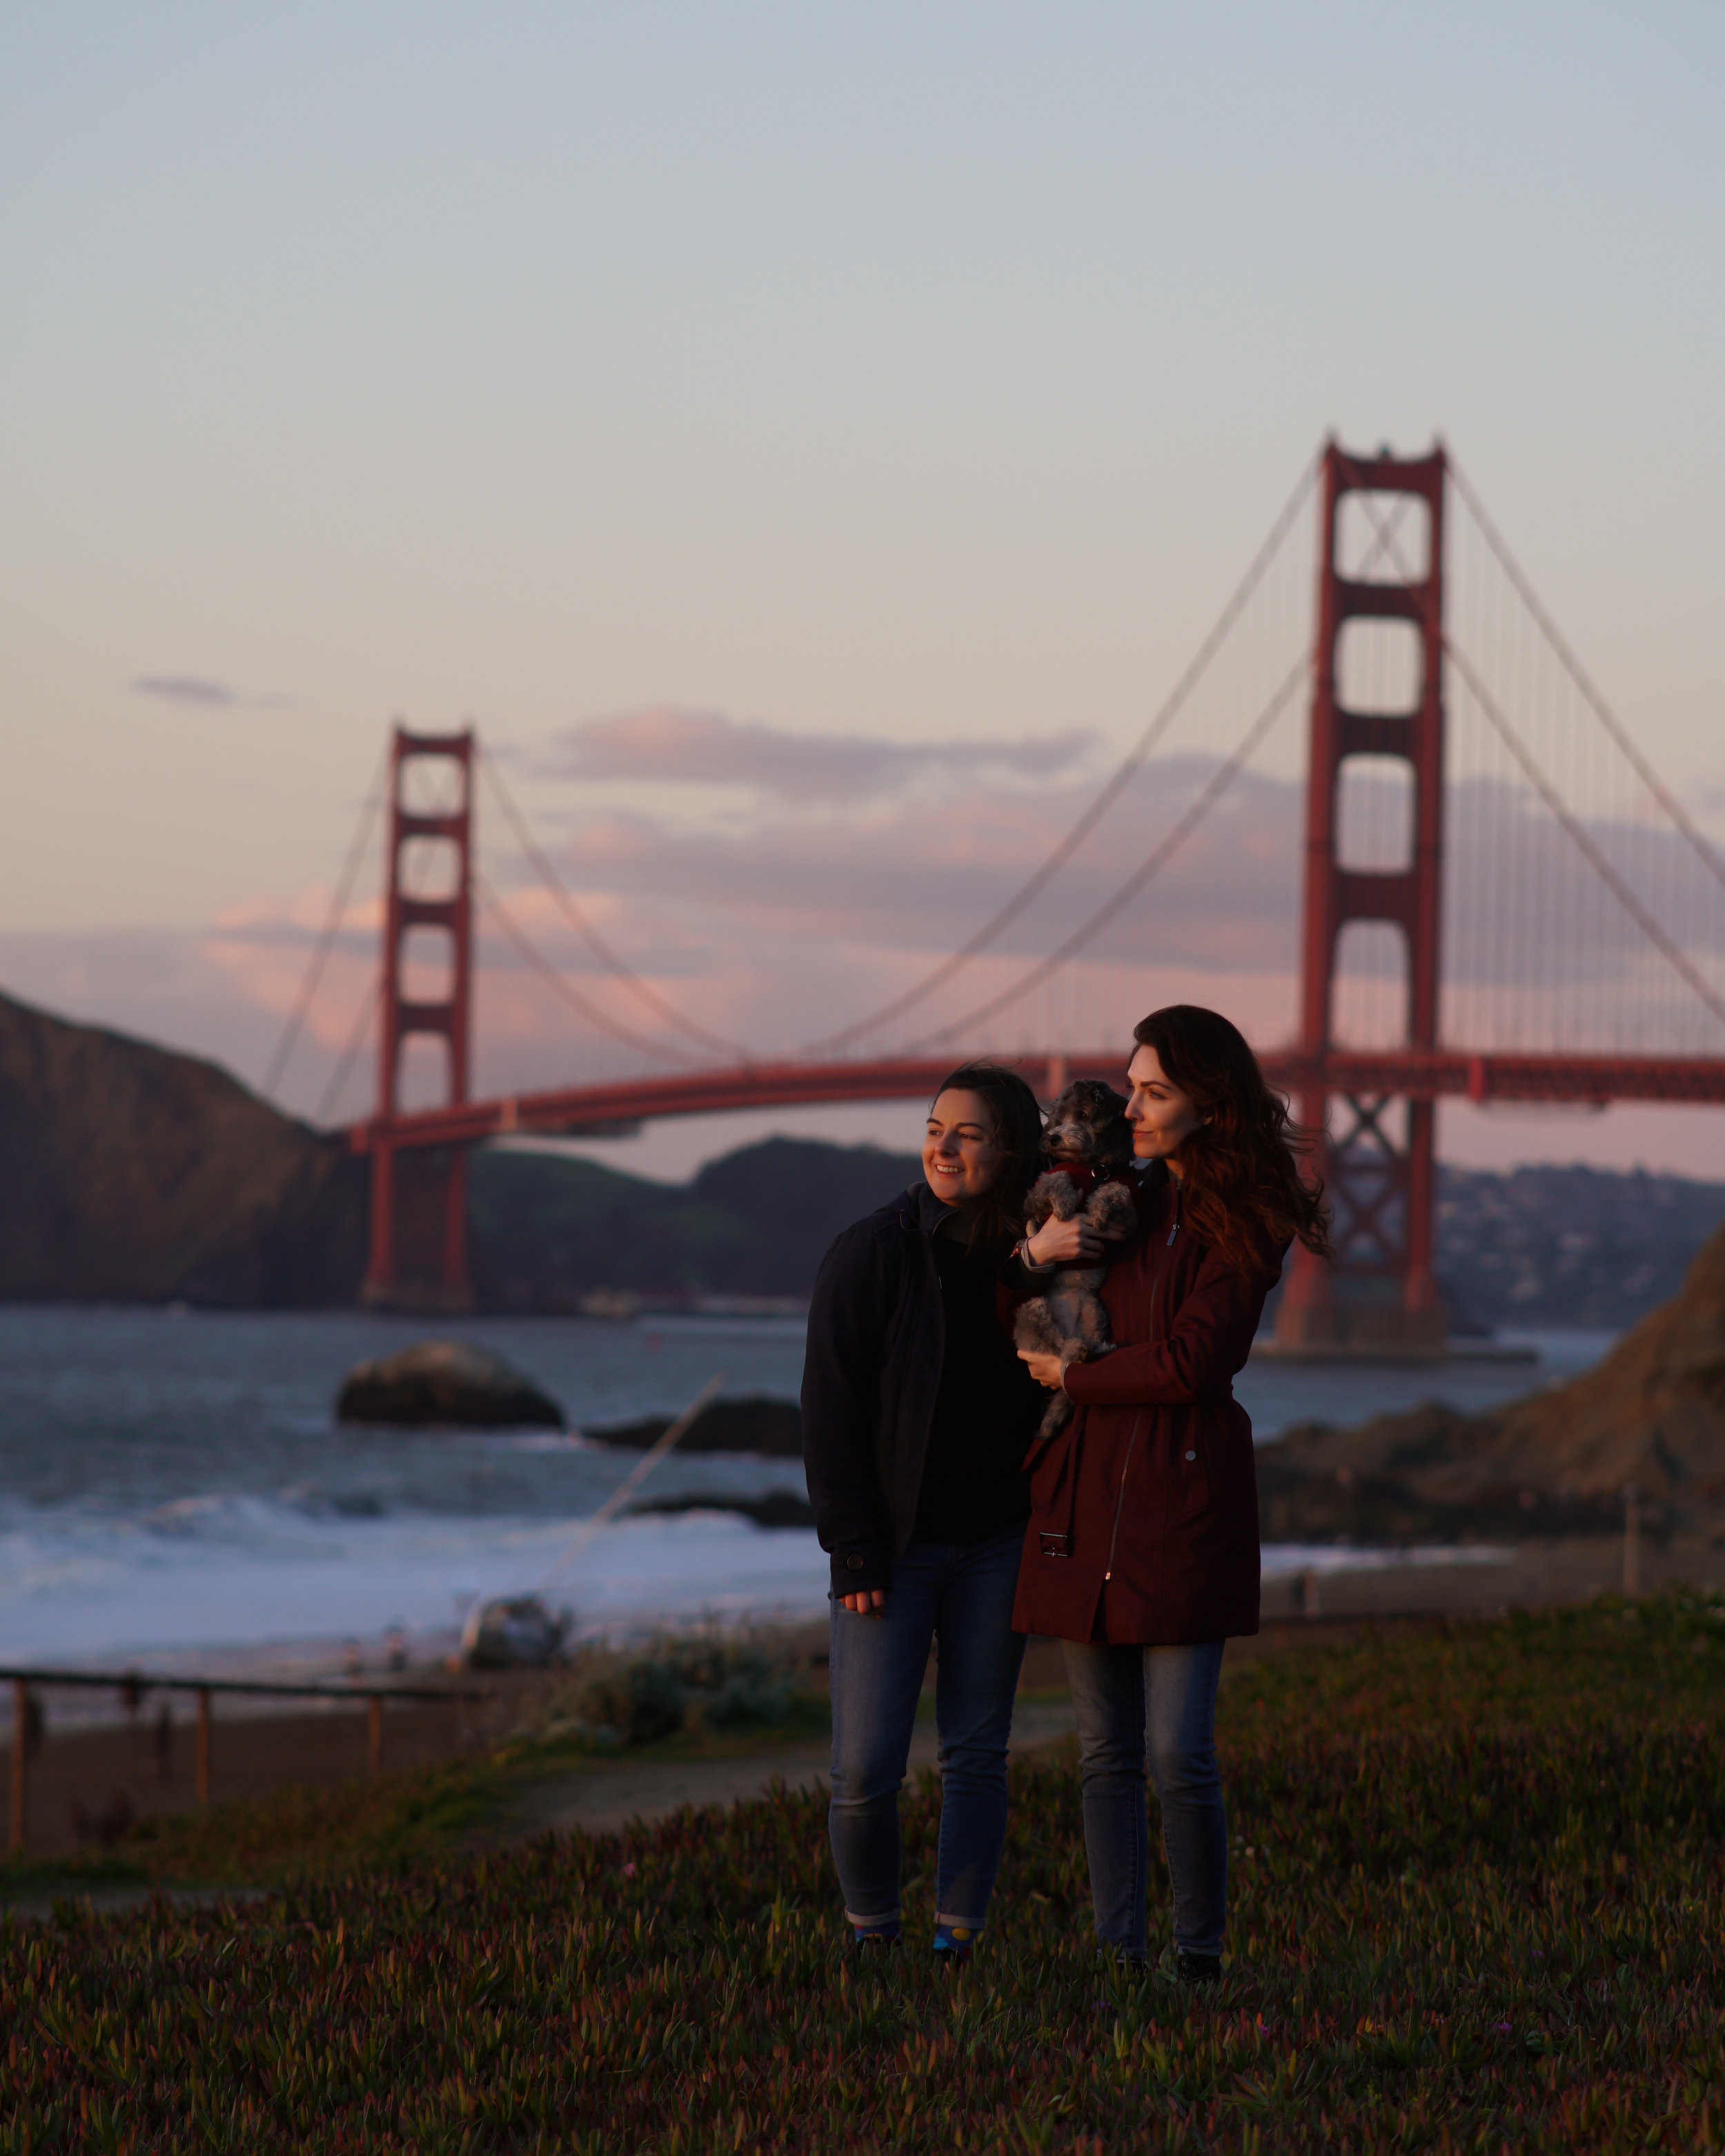 Steph & Katie Golden Gate Bridge.jpg